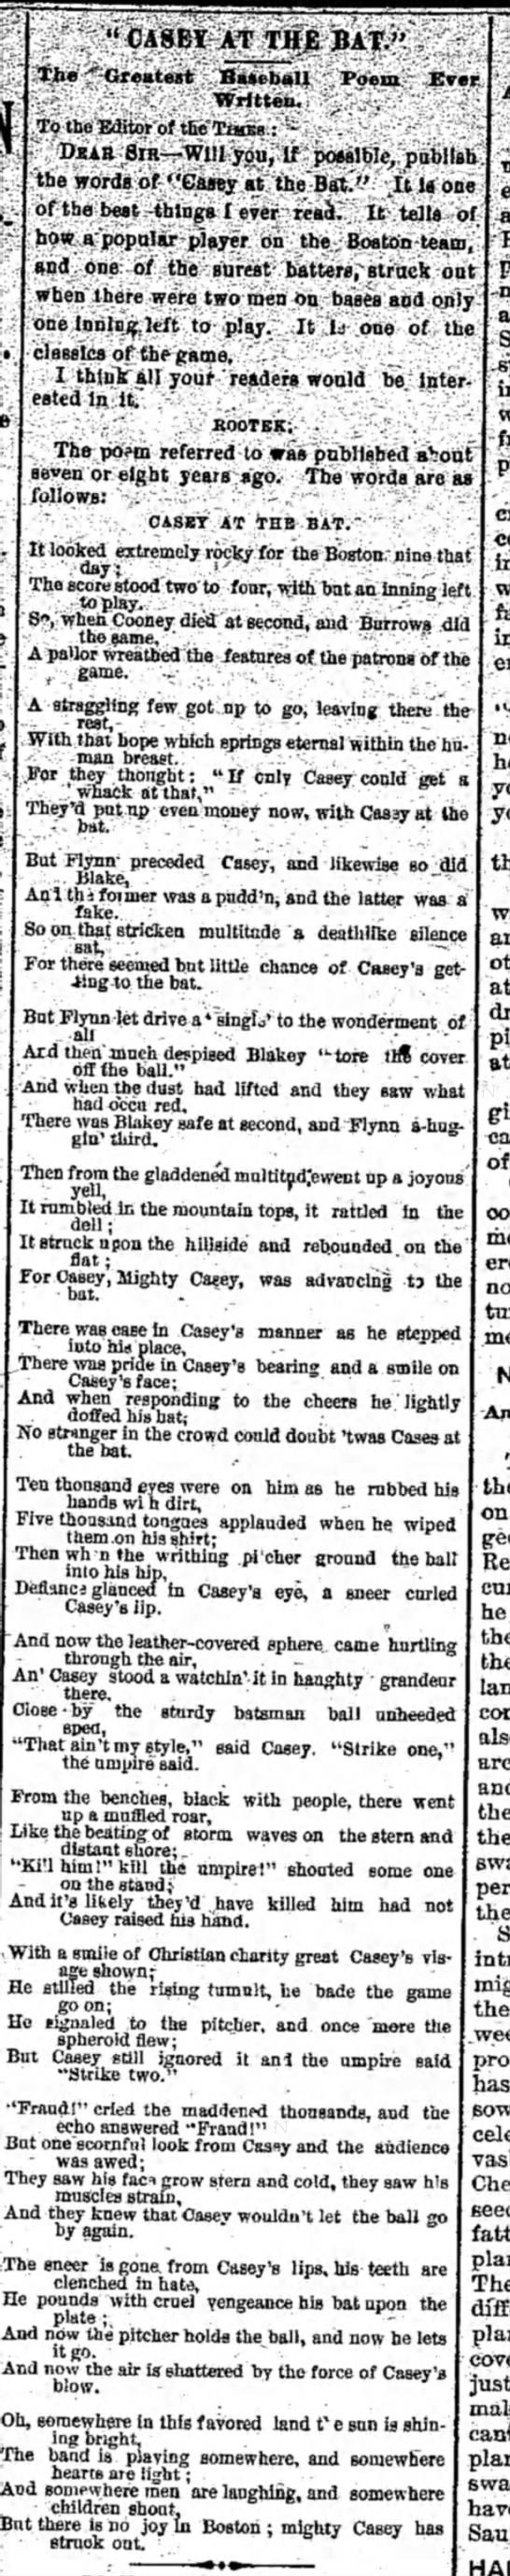 Daily Times New Brunswick, NJ 4 June 1895